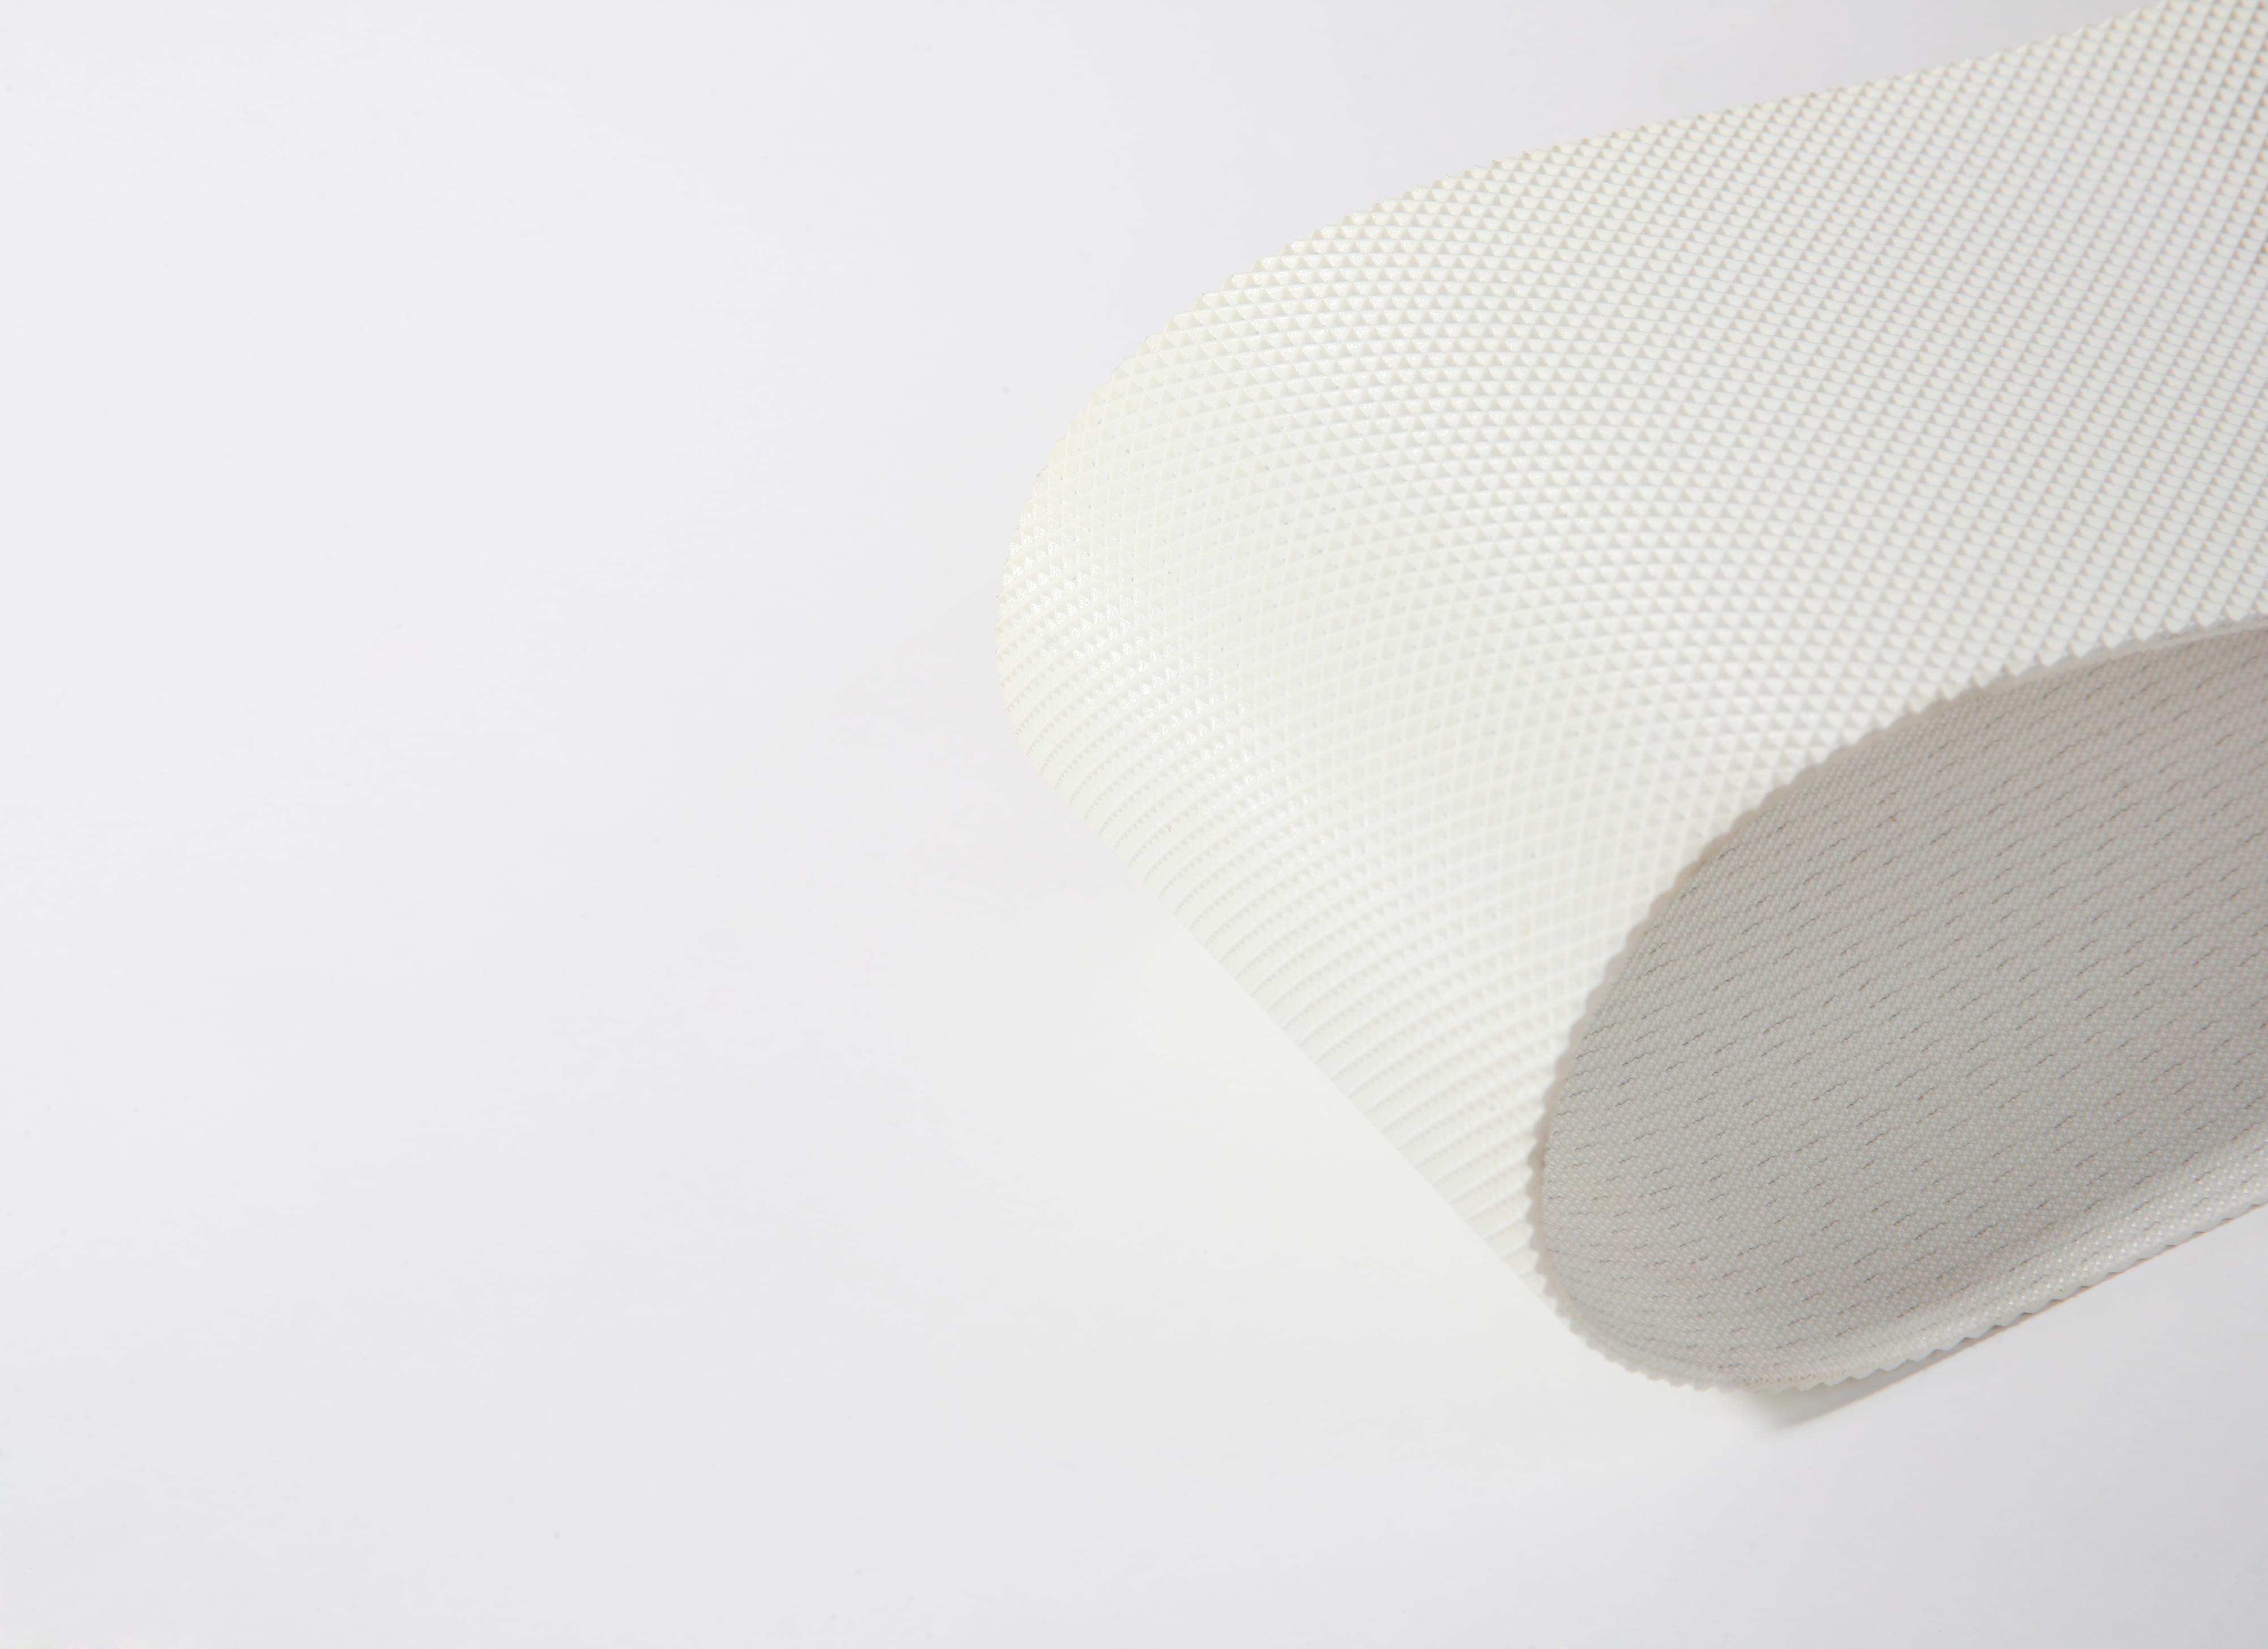 correia Poliuretano (PU) (poliuretano) branco perfil pirâmide negativa